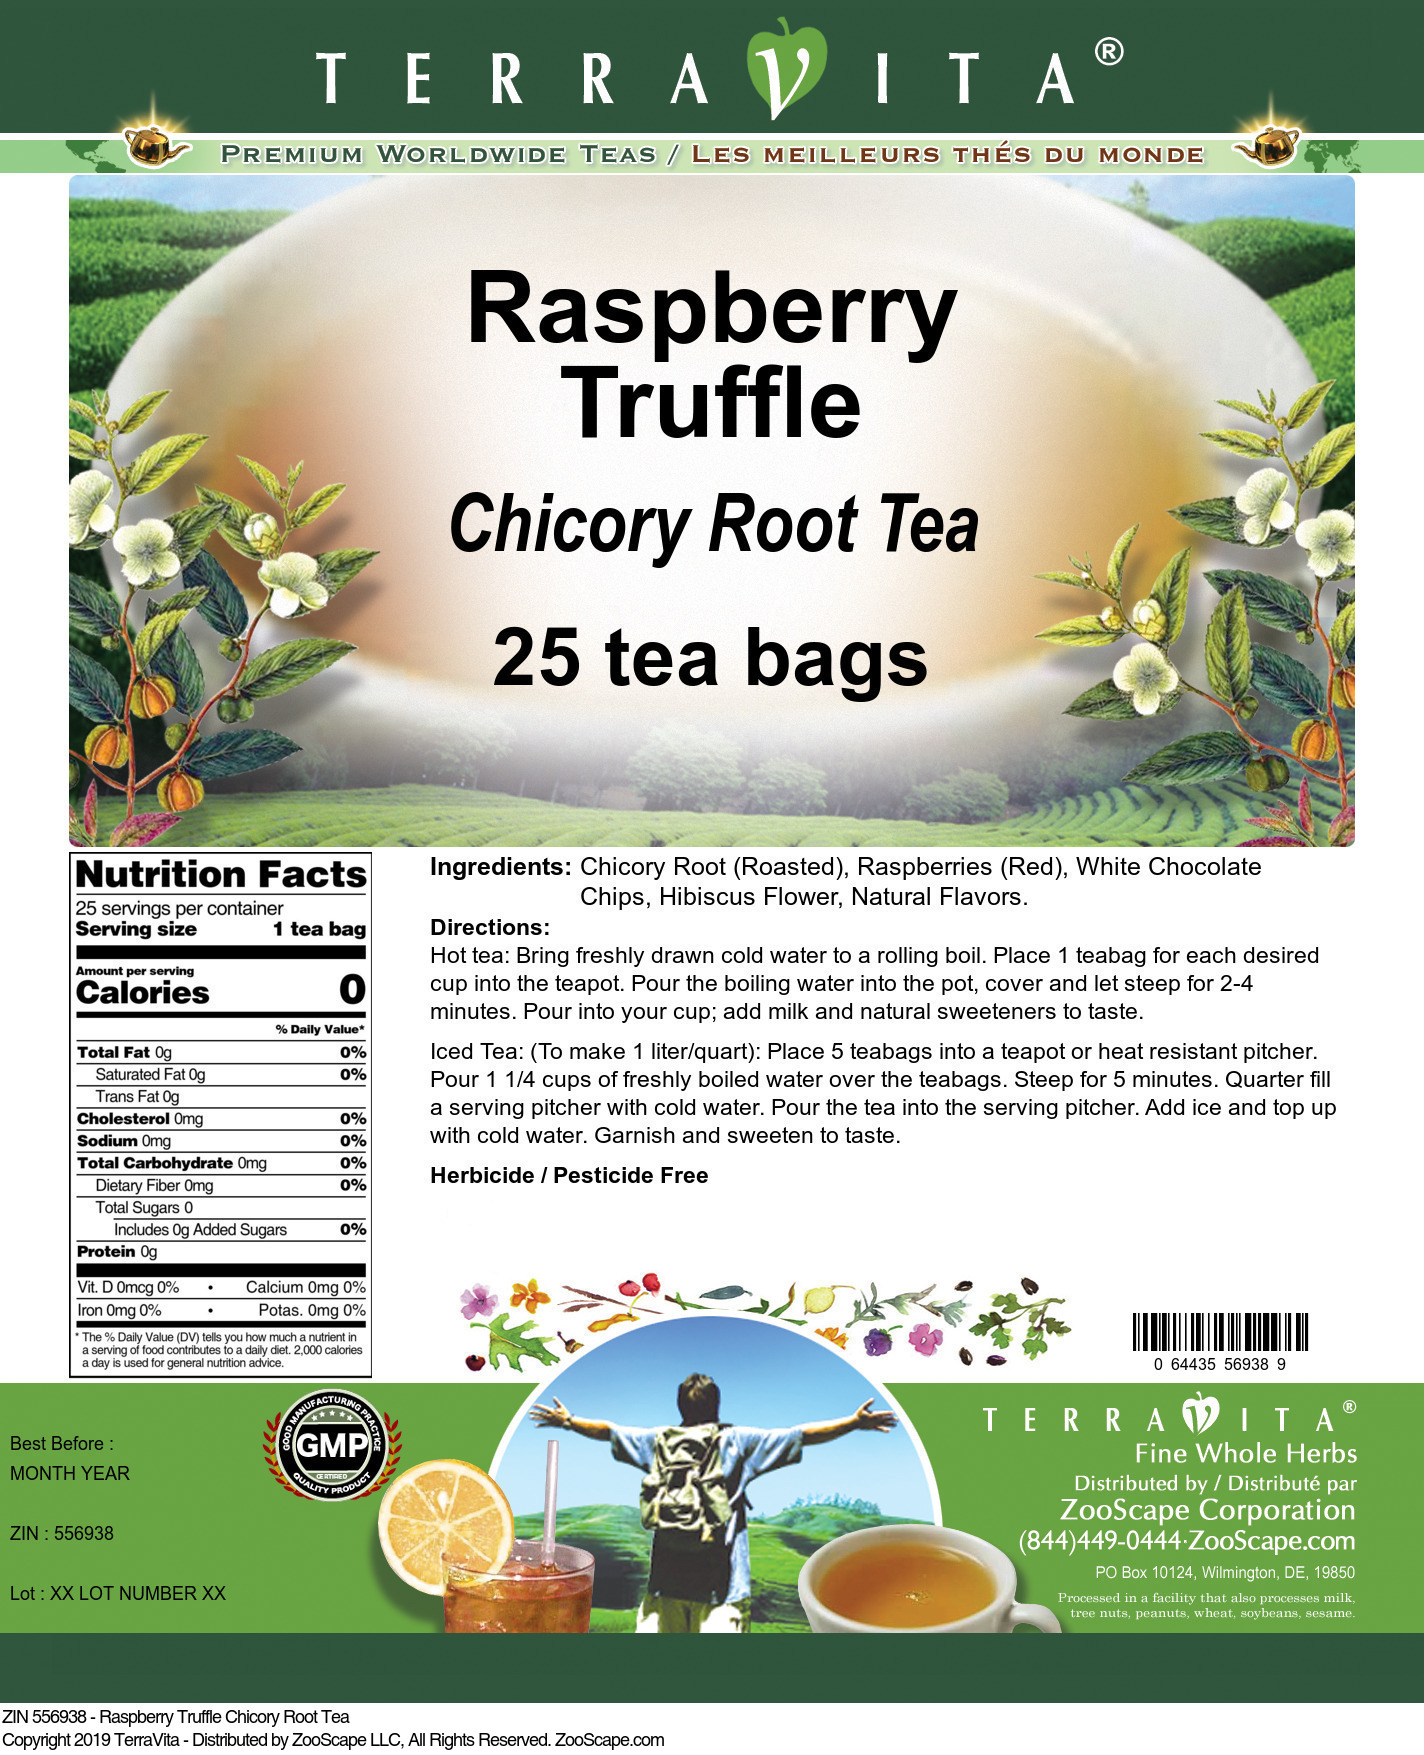 Raspberry Truffle Chicory Root Tea